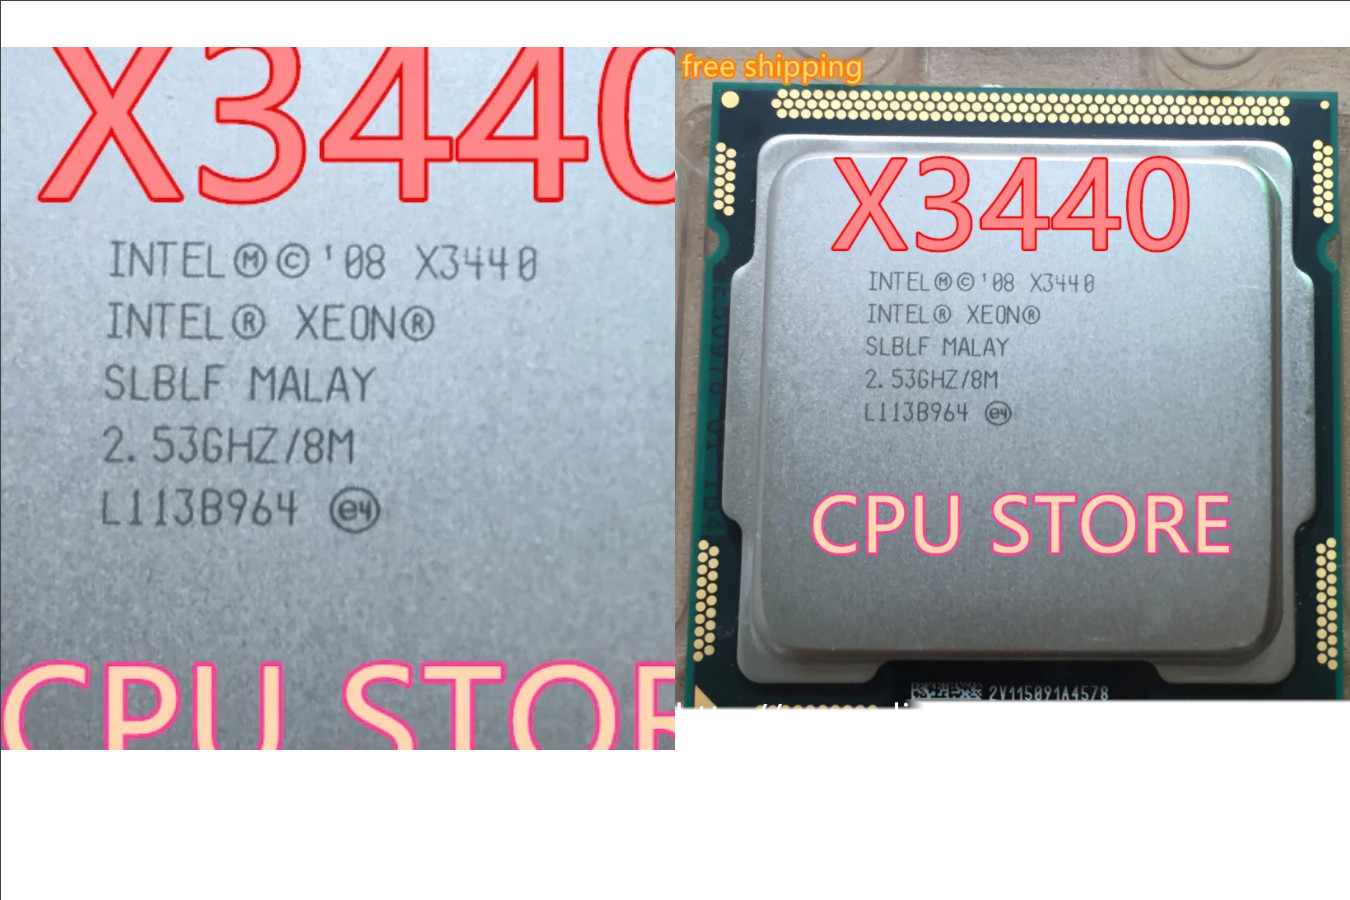 Четырехъядерный процессор — Intel Xeon X3440